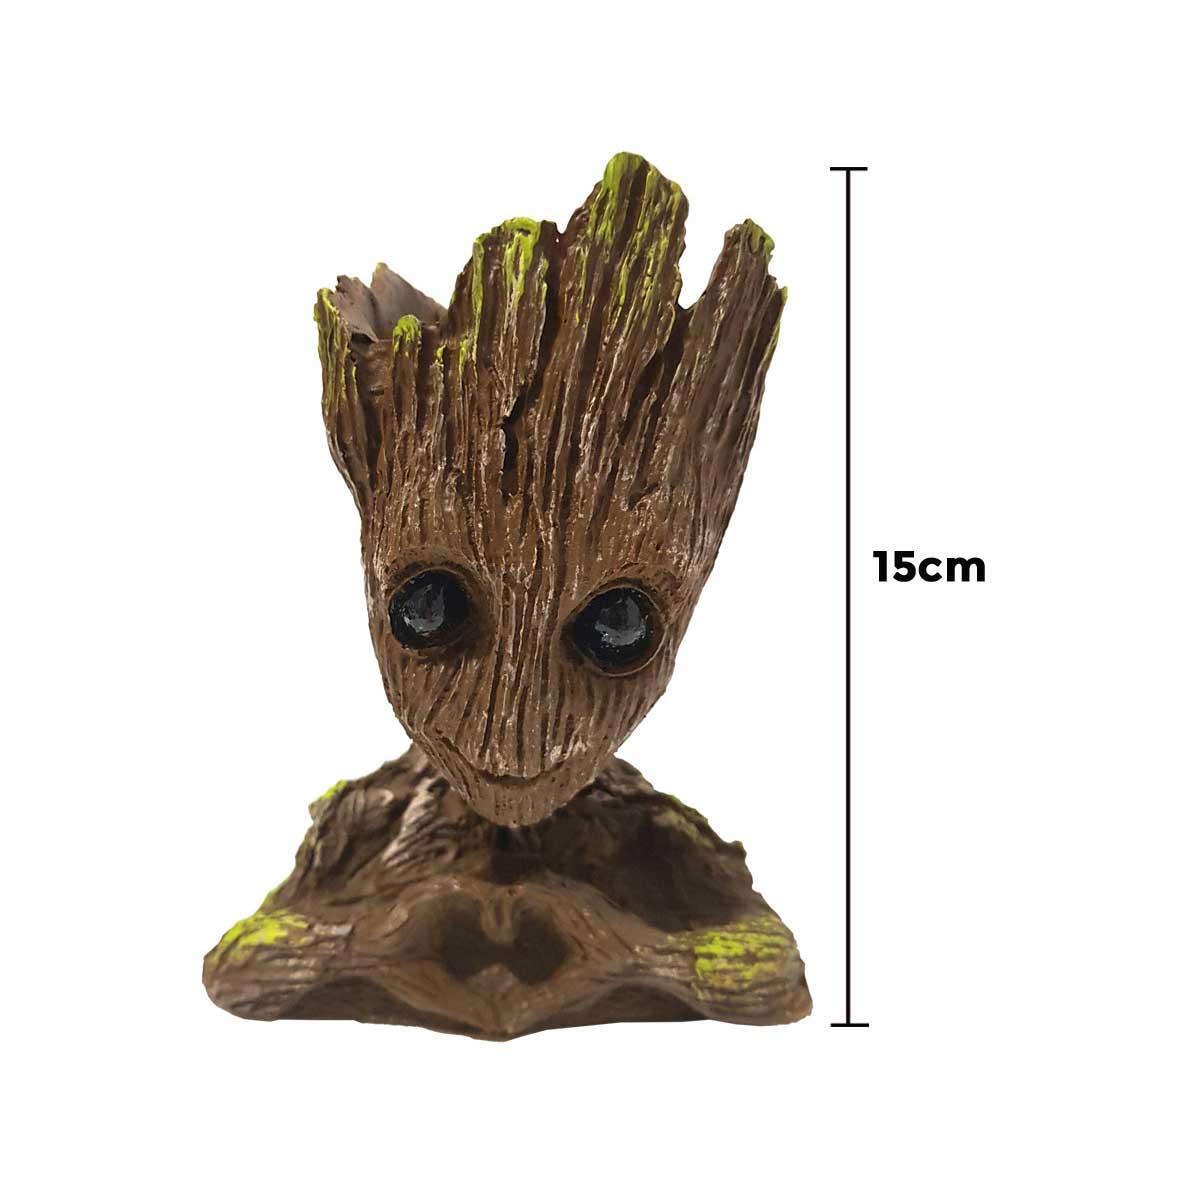 Baby Groot Vaso Porta Objetos Resina 15 Cm Diversos Modelos